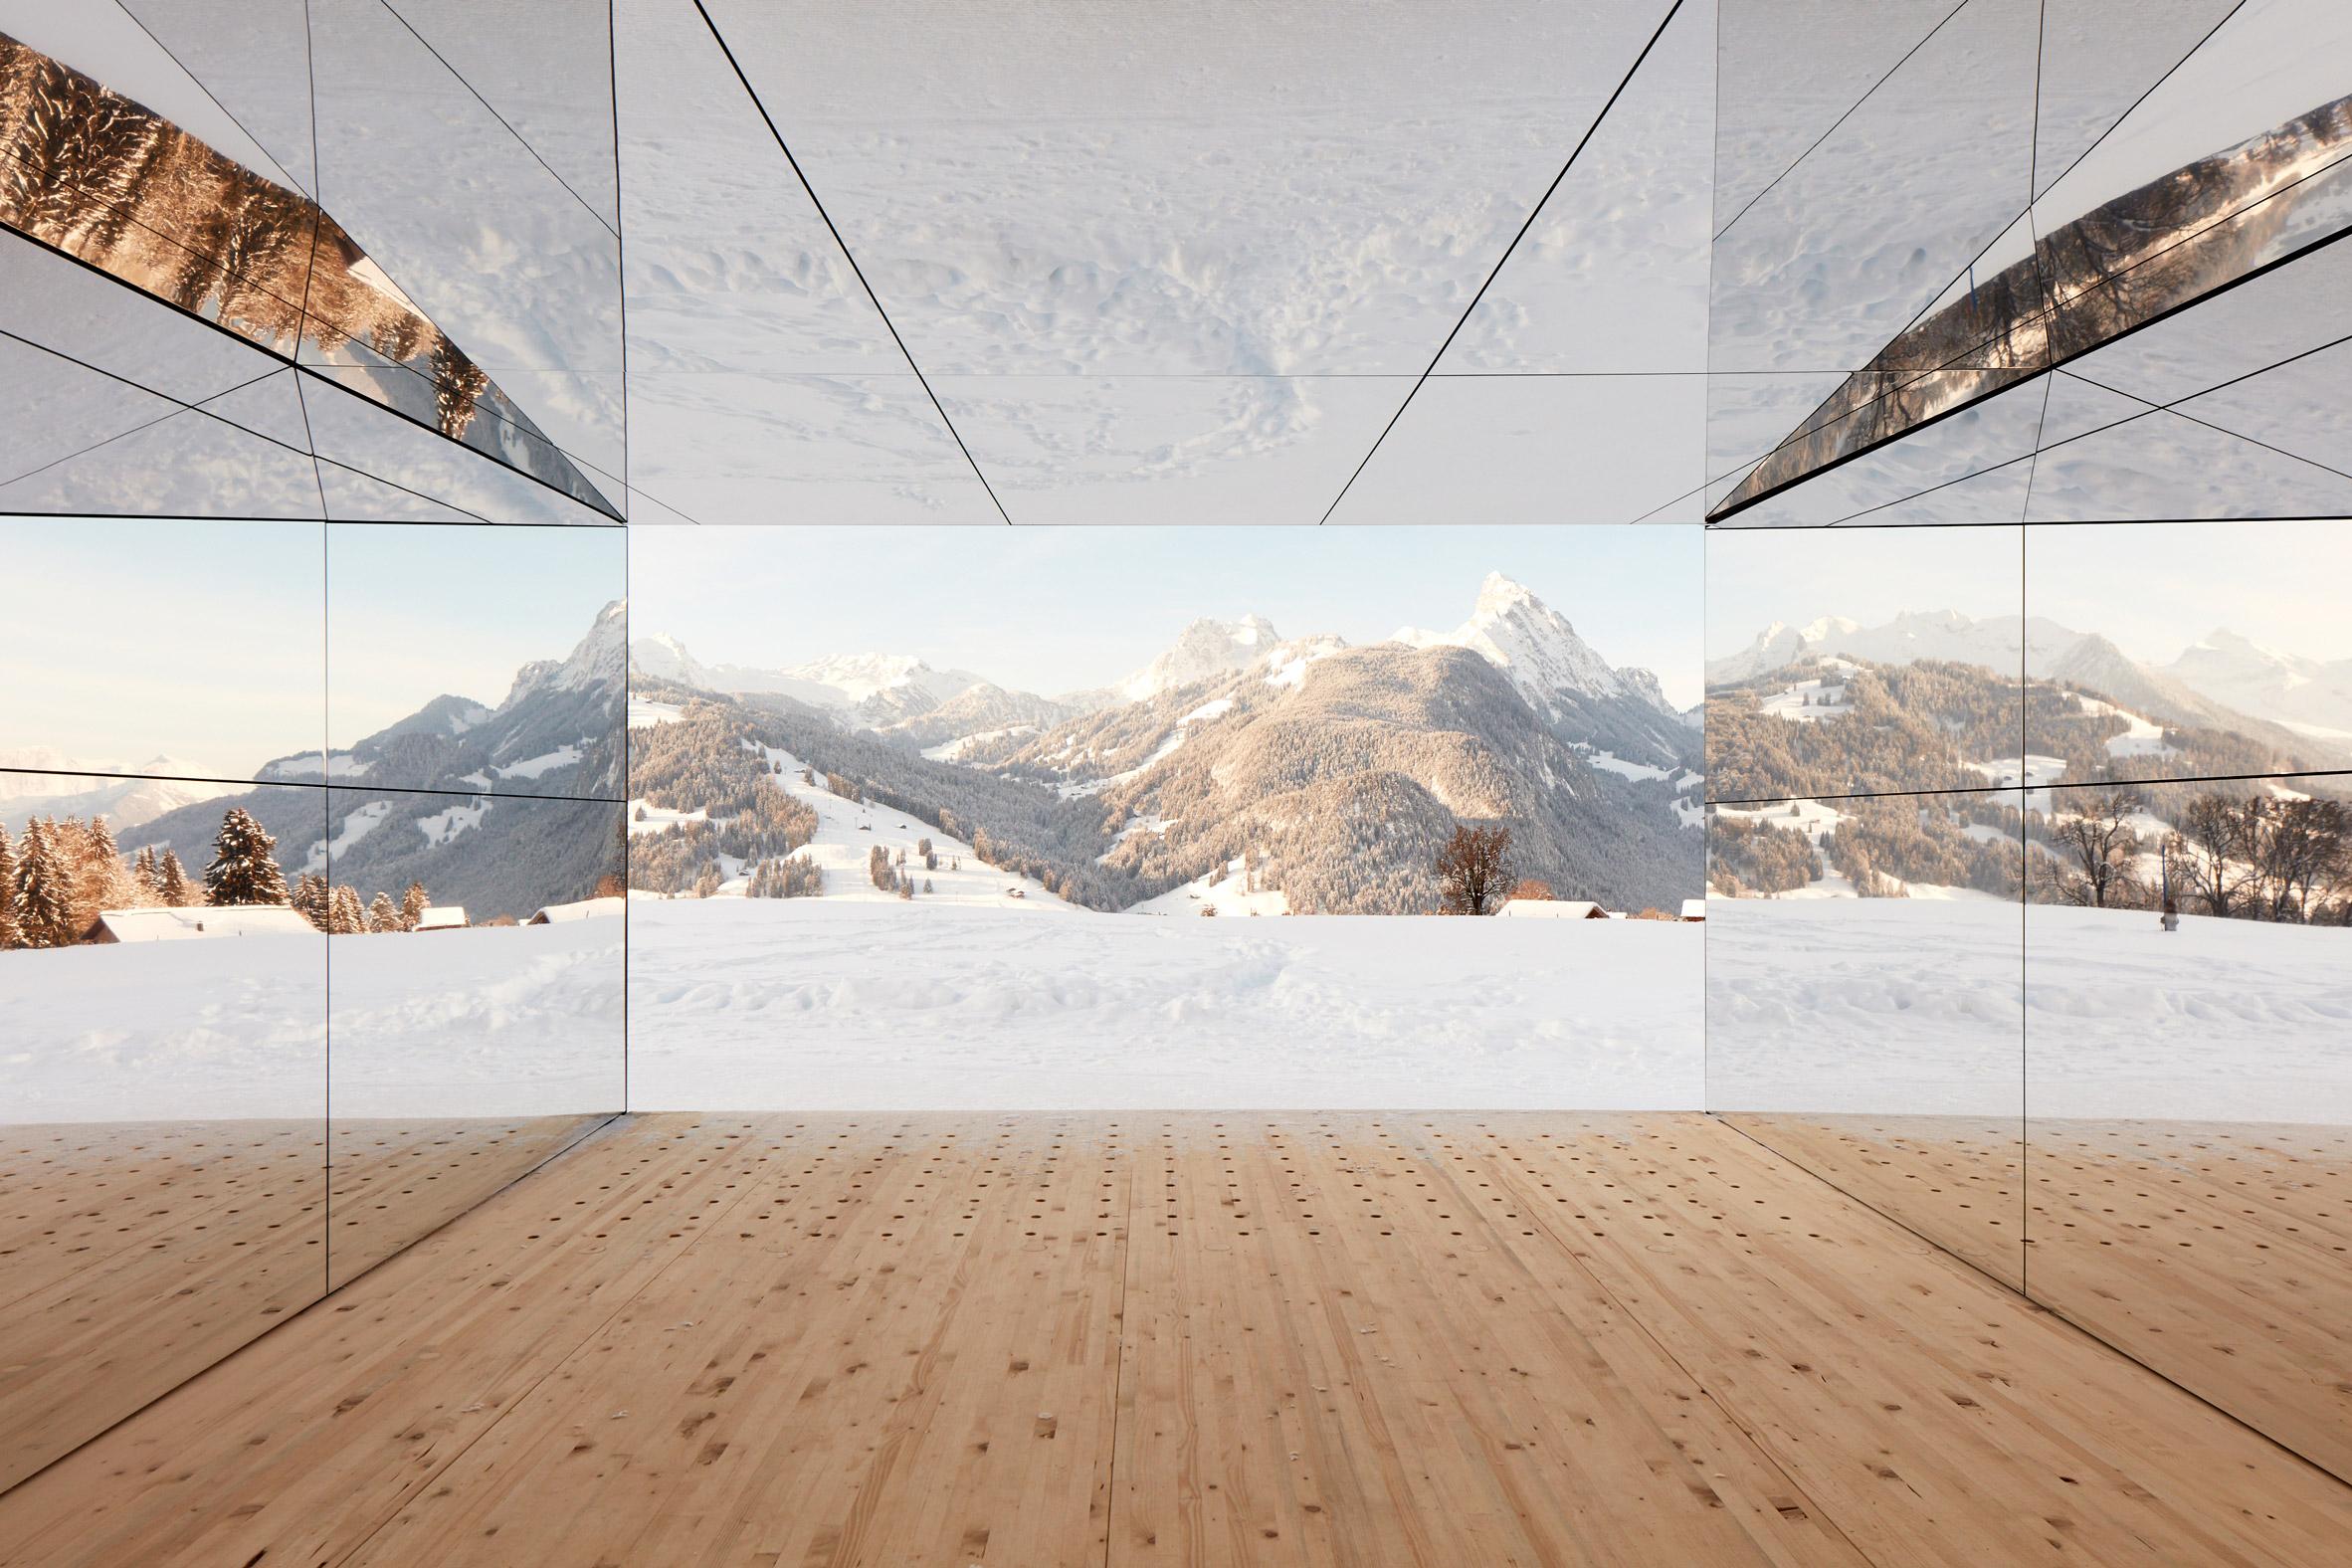 Mirage Gstaad mirrored building art installation by Doug Aitken in Switzerland from inside